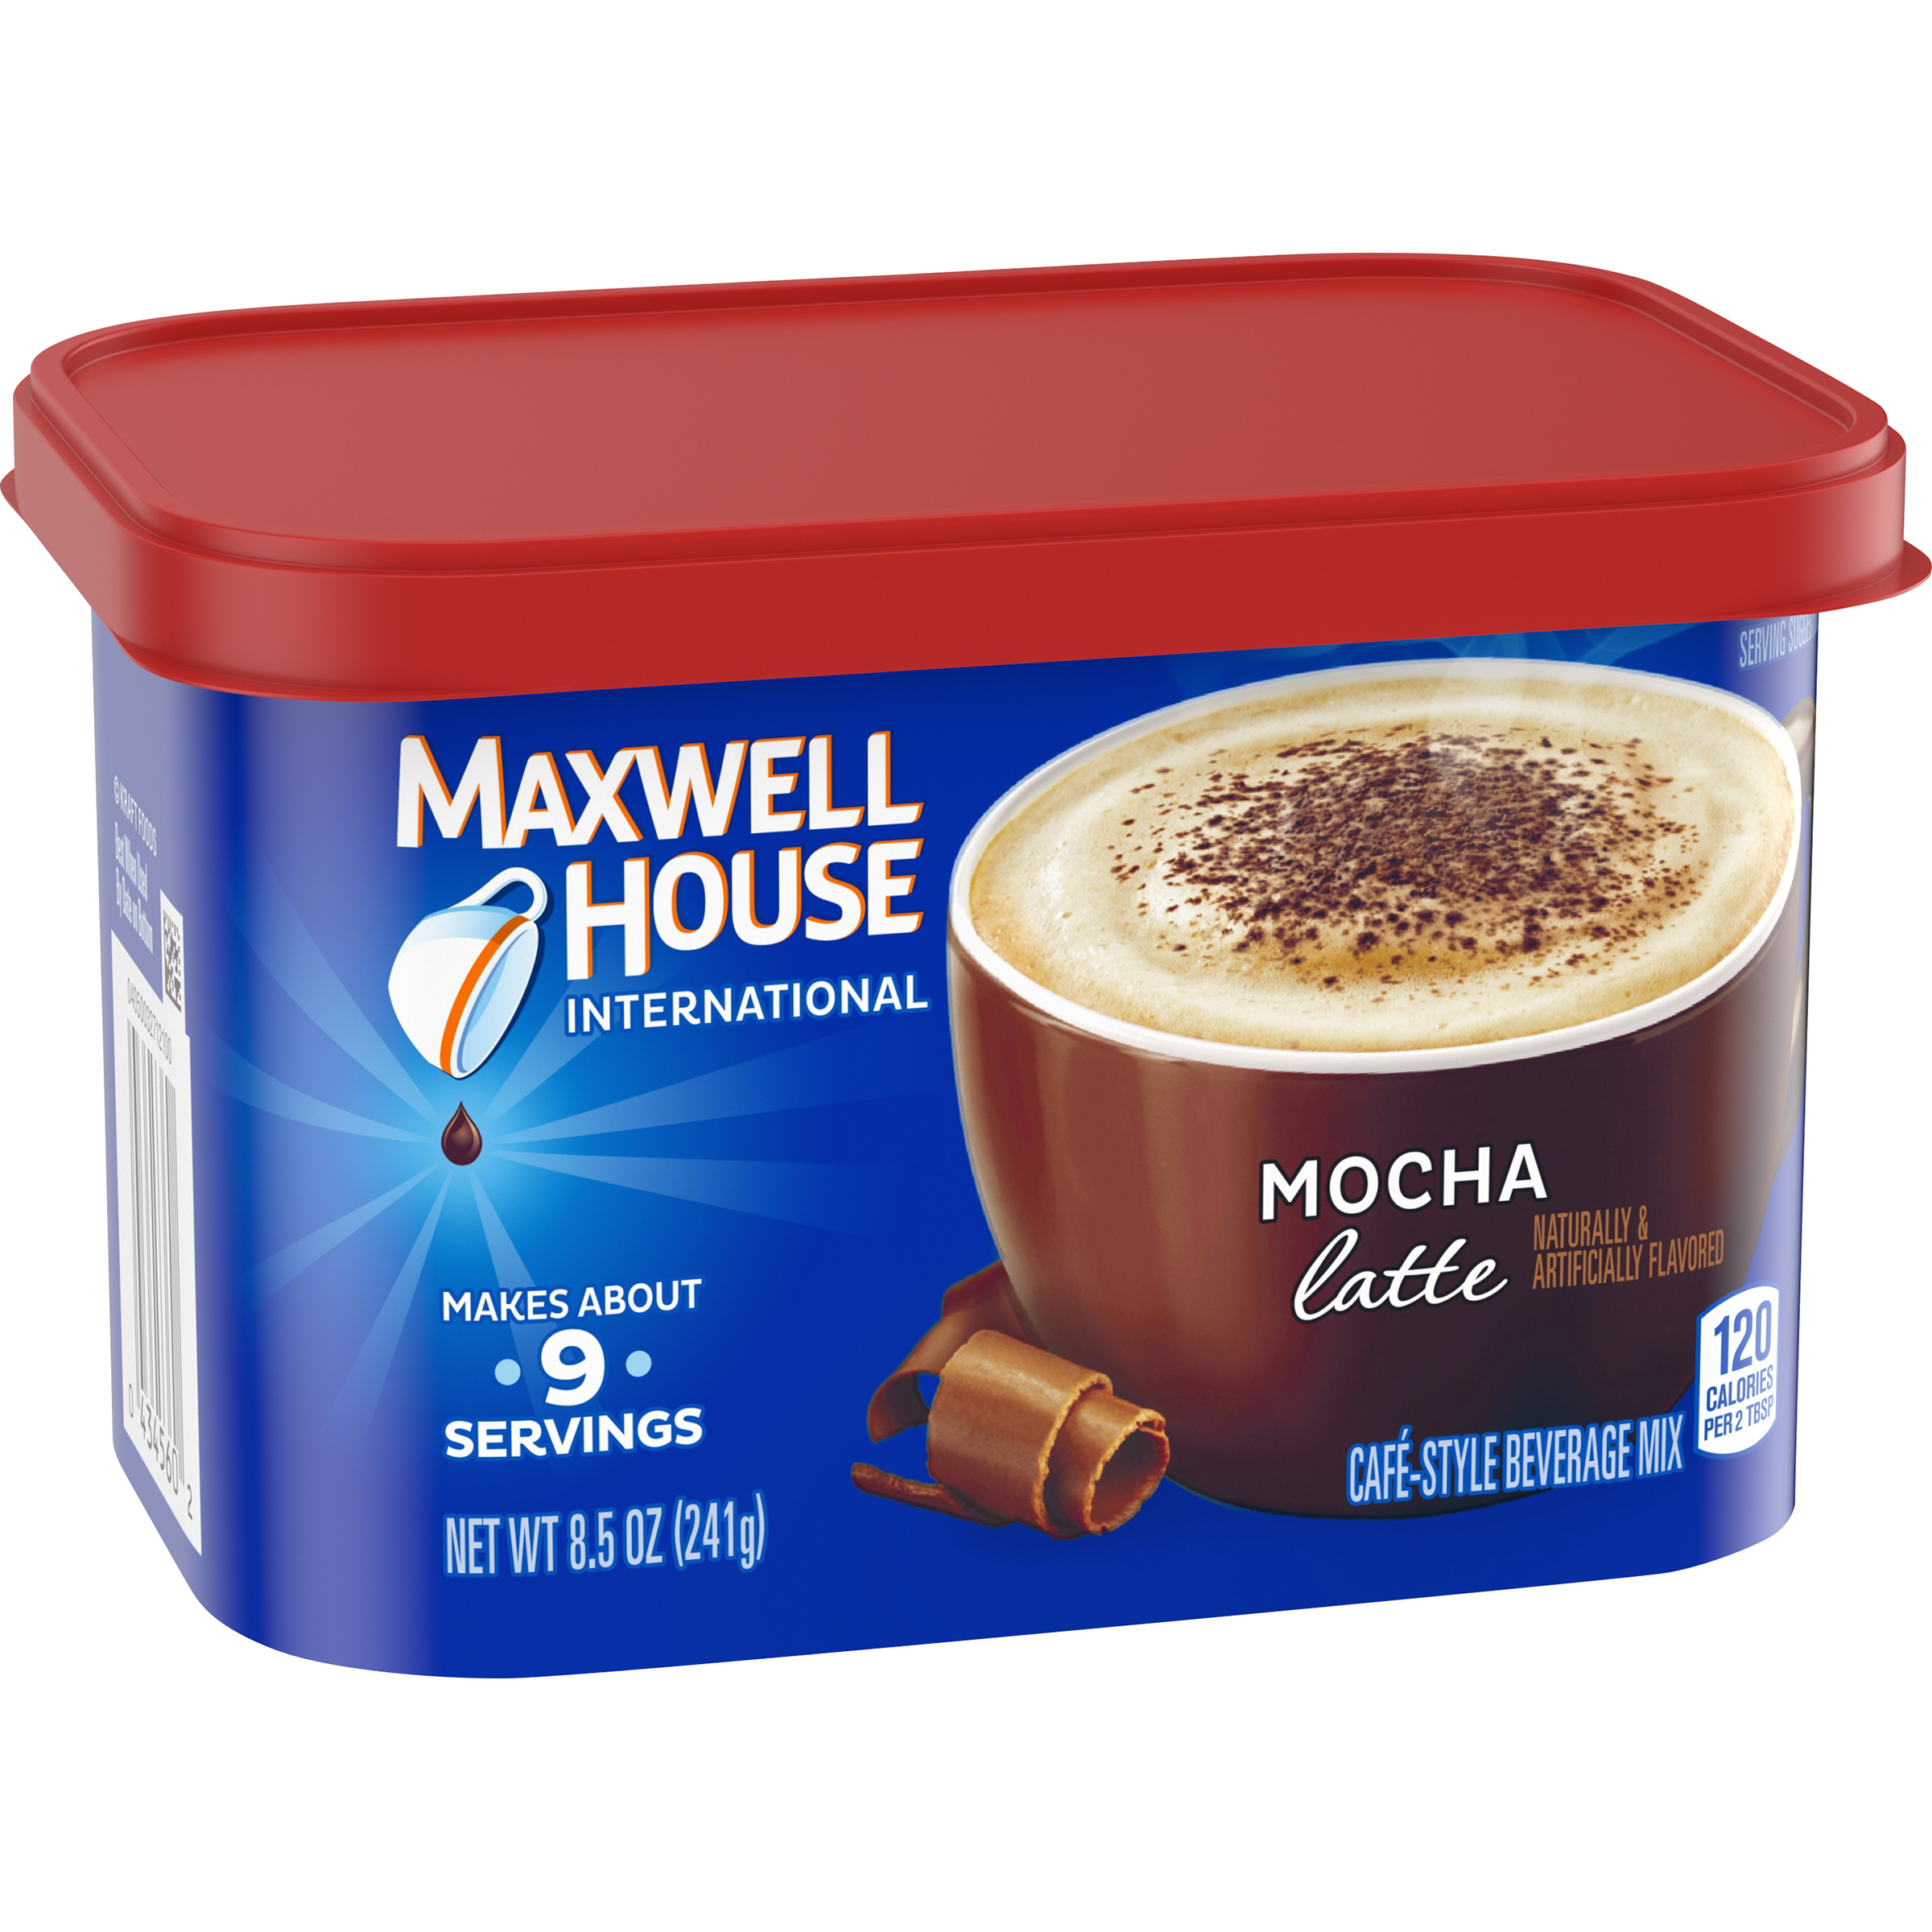 Maxwell House International Mocha Latte Cafe Style